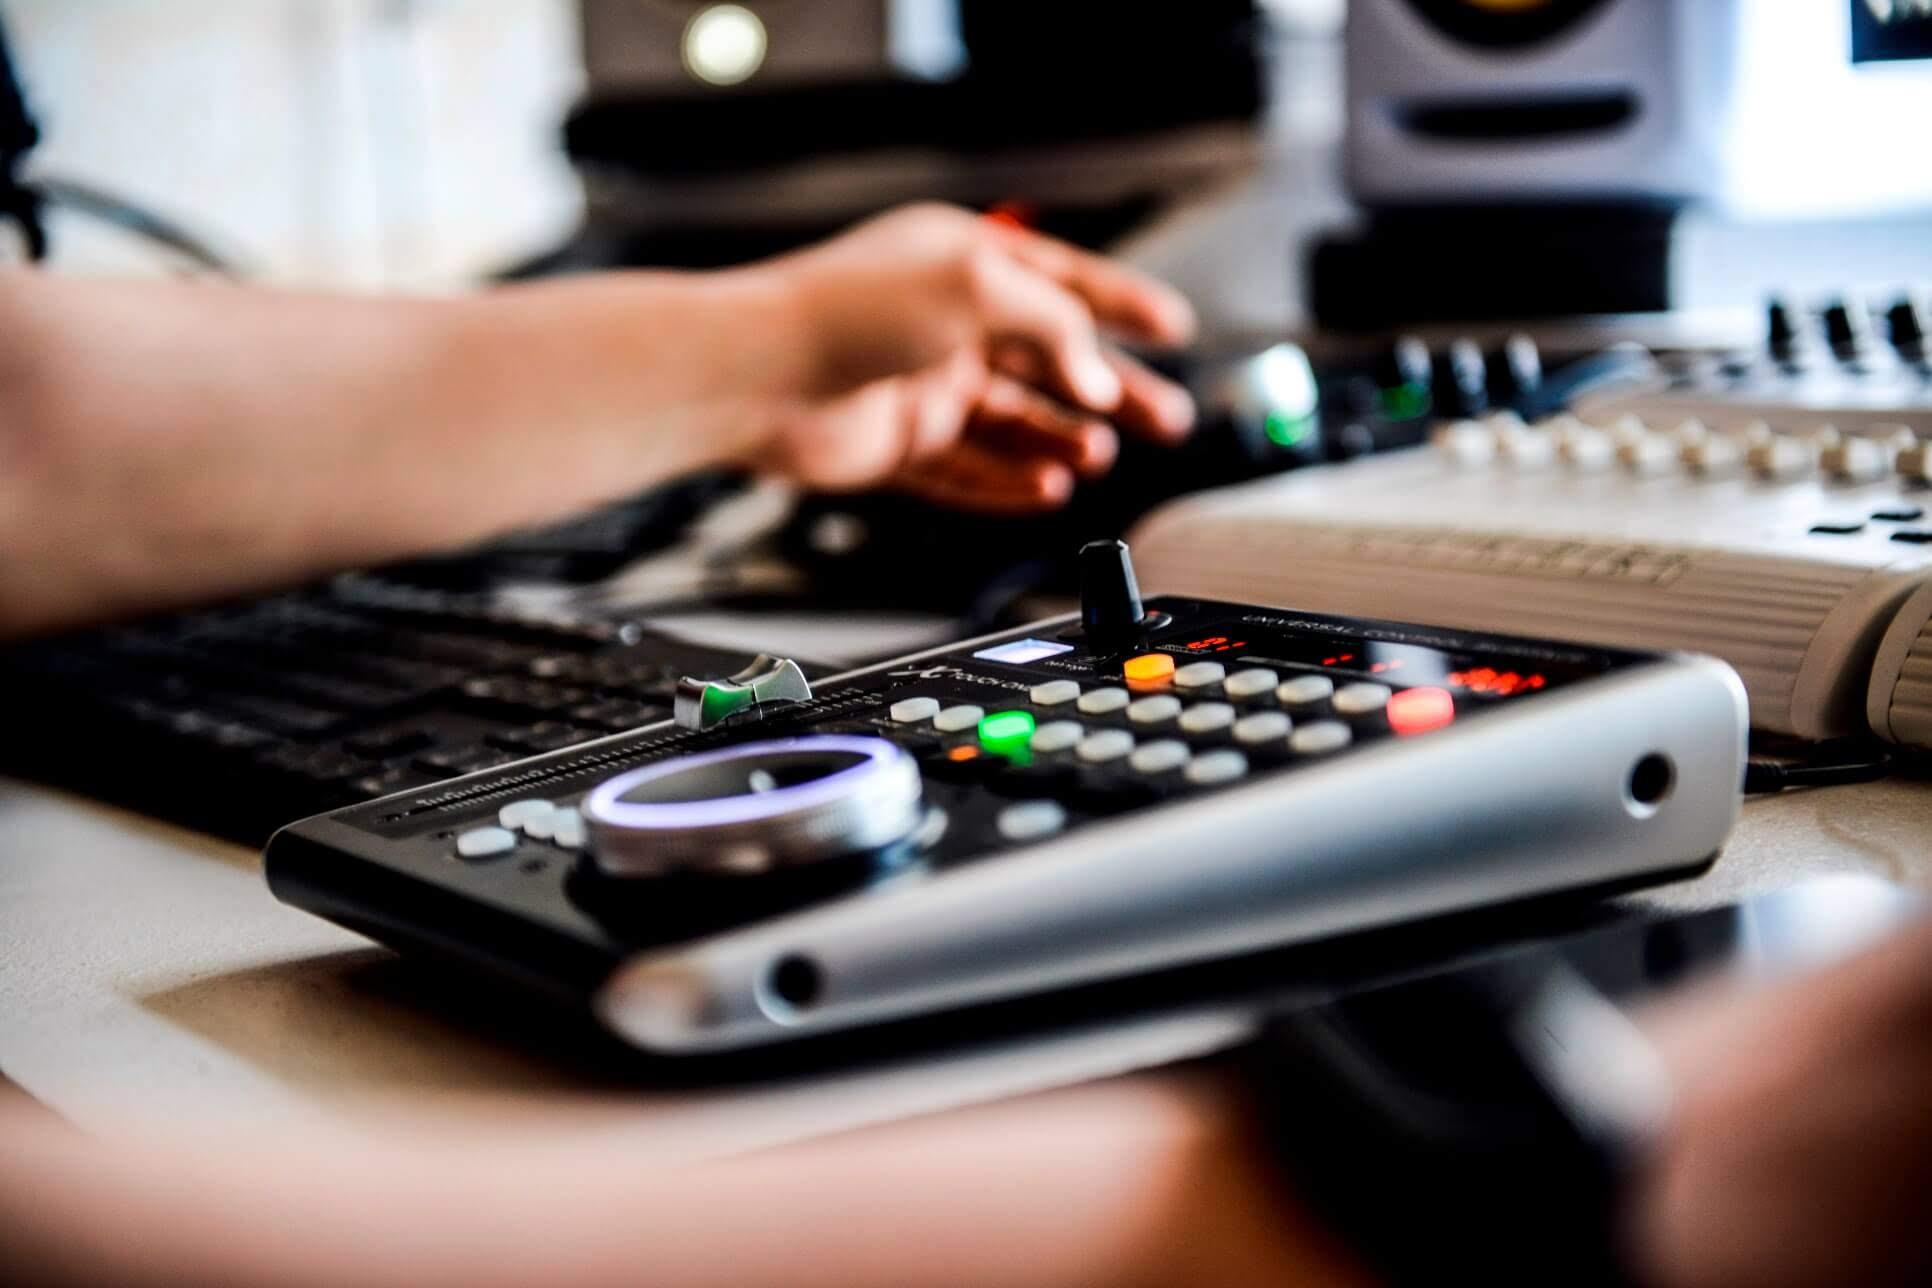 Tonstudio Güstrow DJ MArtin BAde